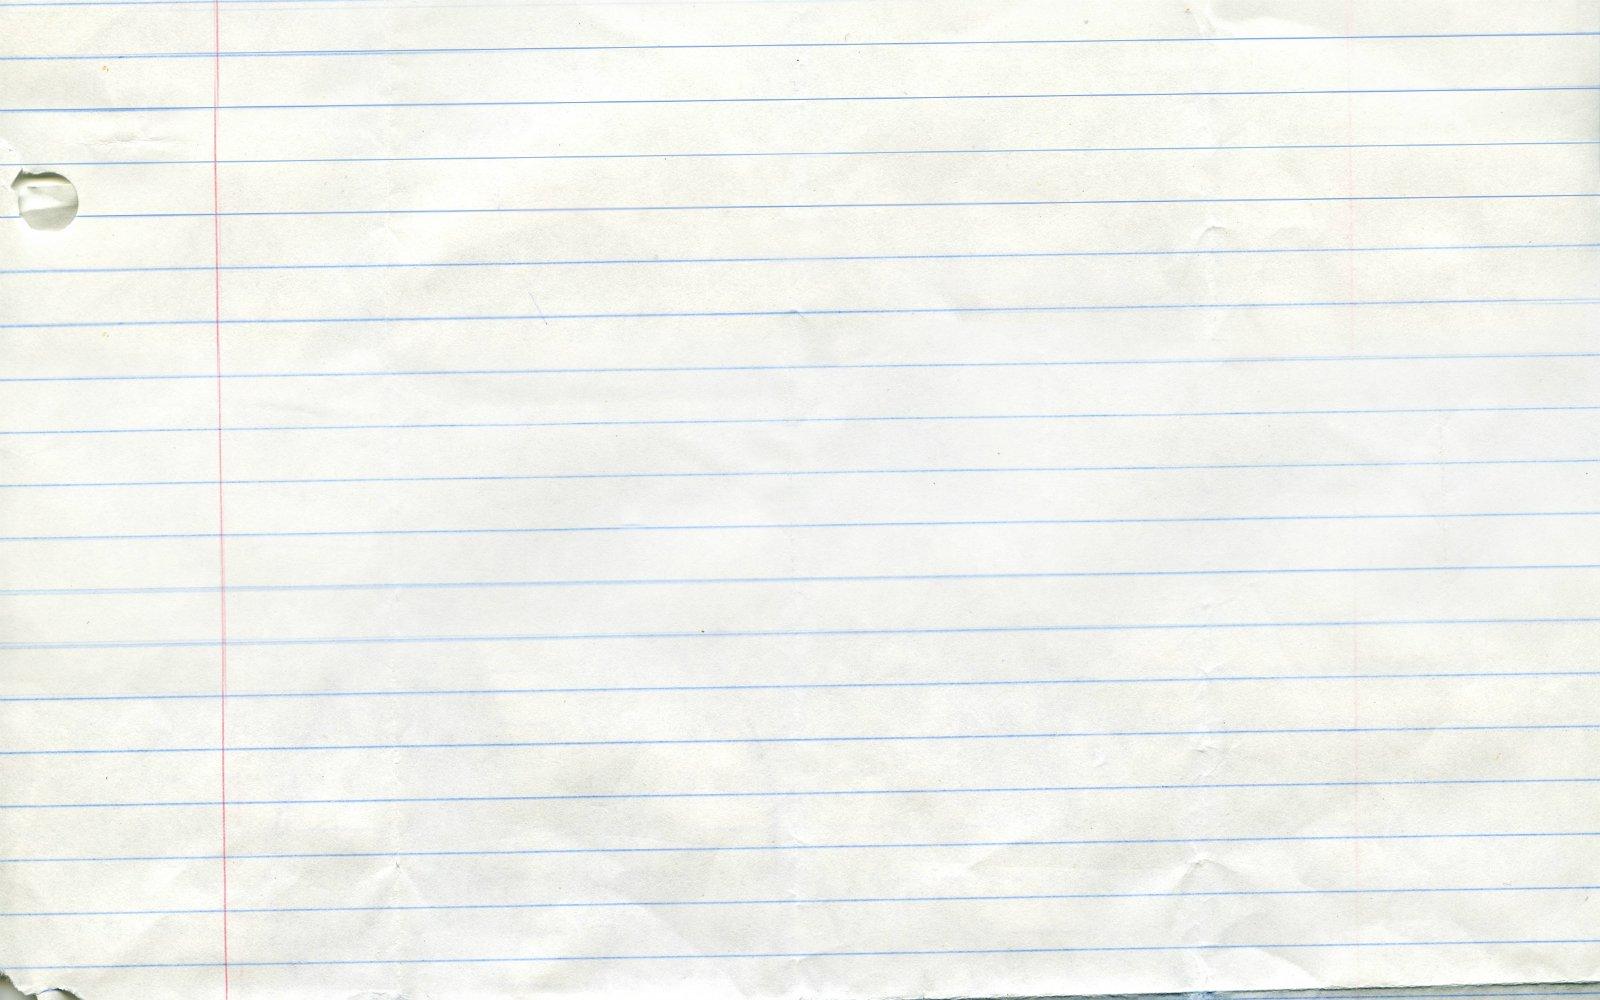 Online Notebook Paper 1600x1000